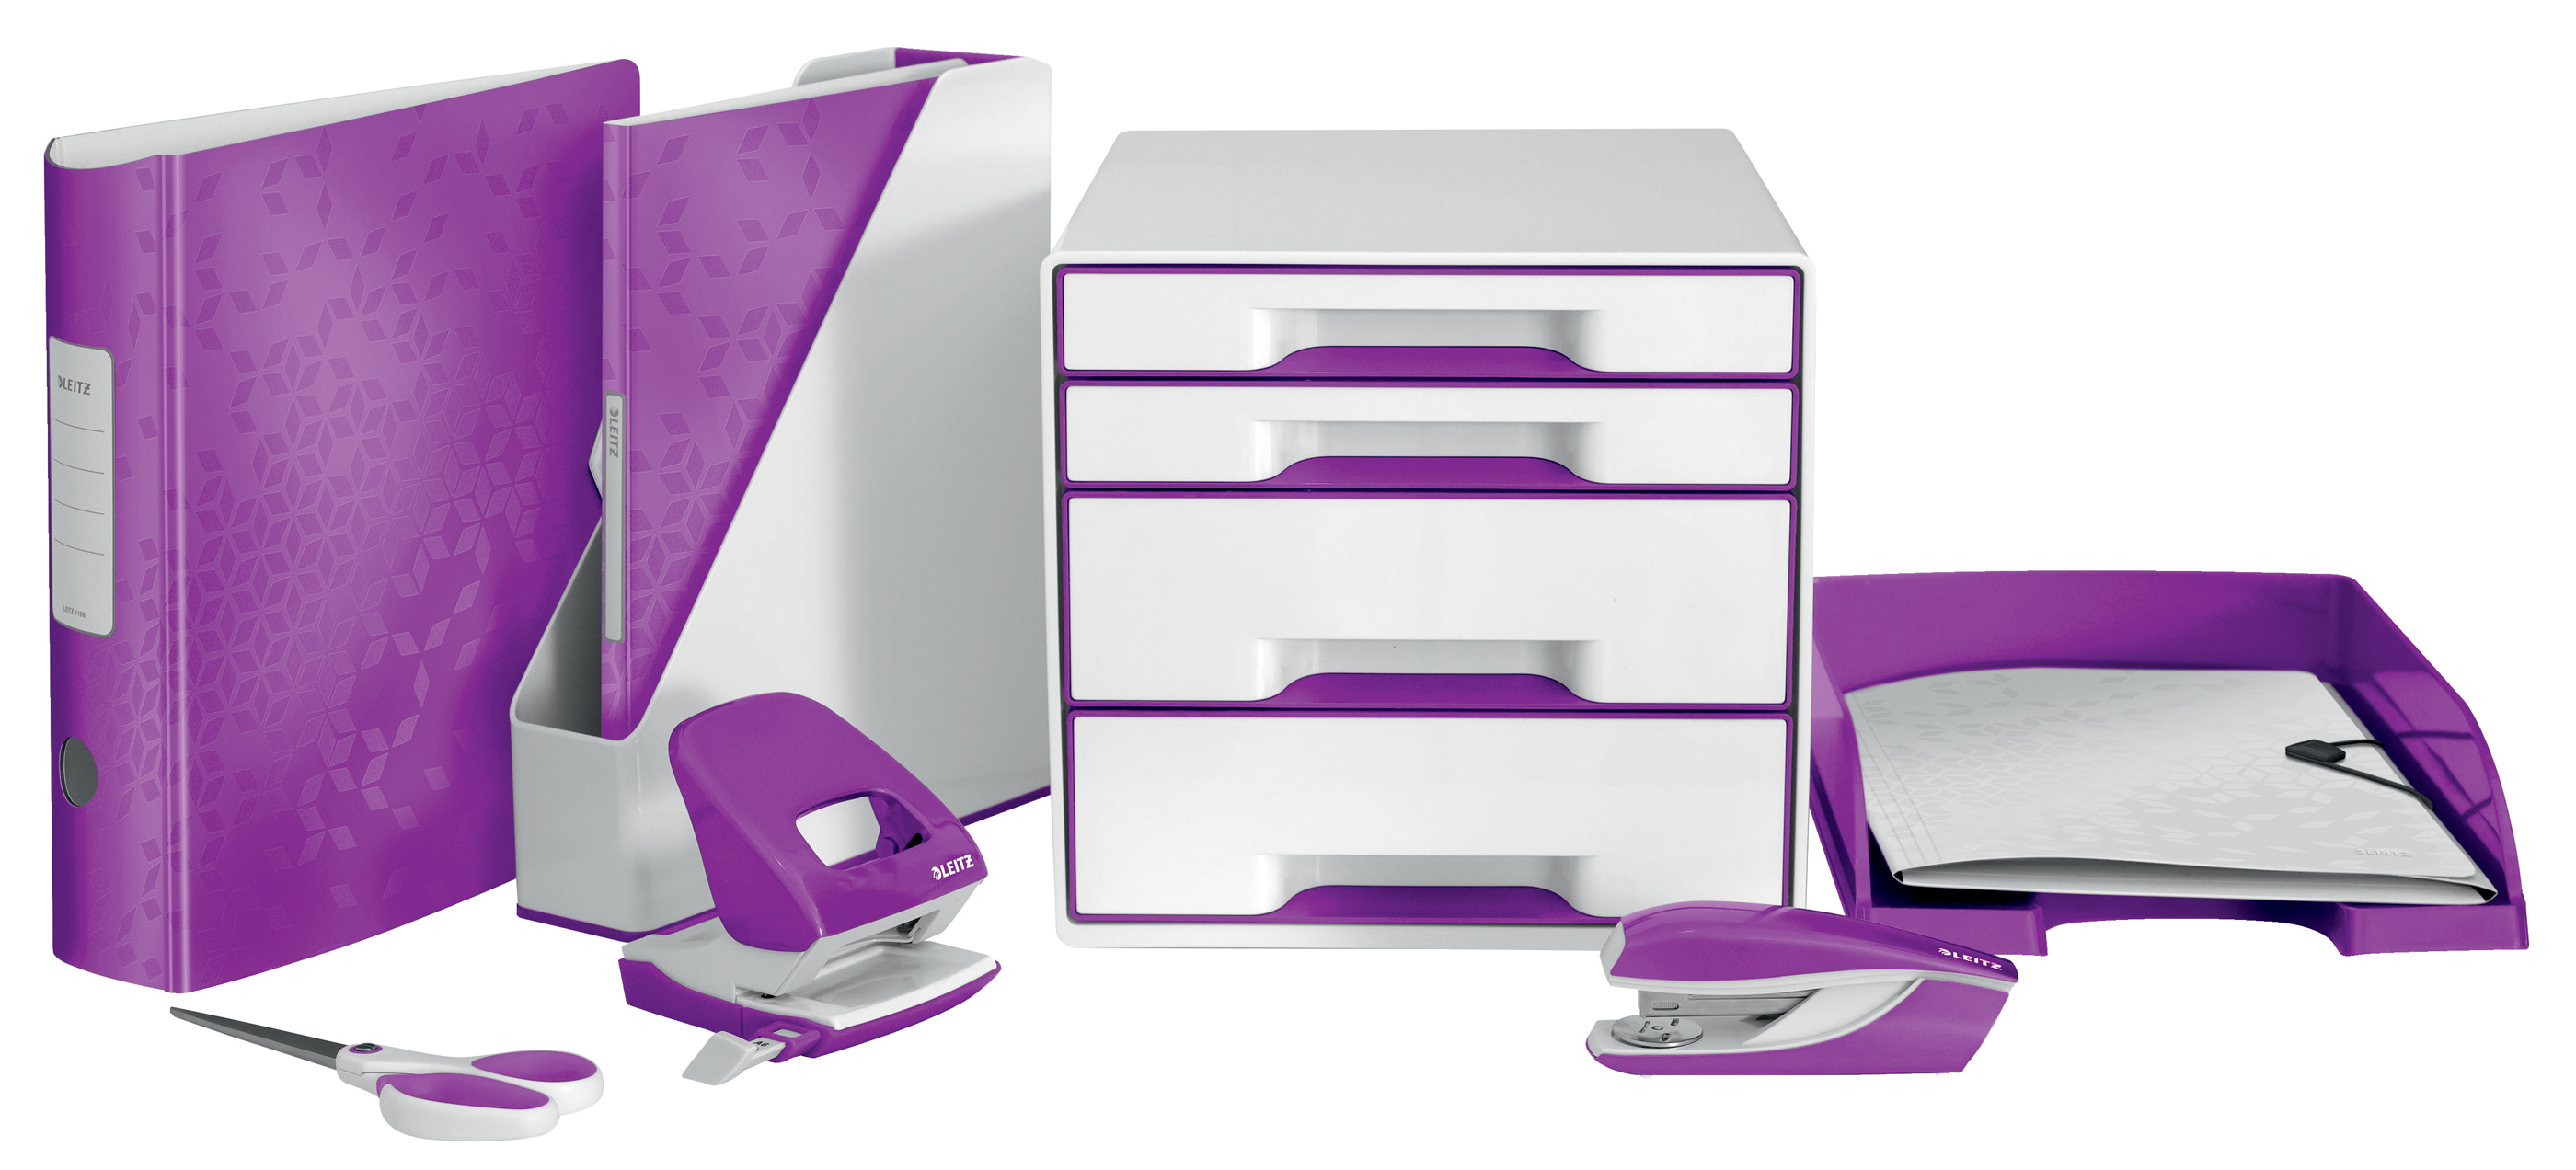 Лоток горизонтальный Wow, метал., пурпур. LEITZ - фото 4